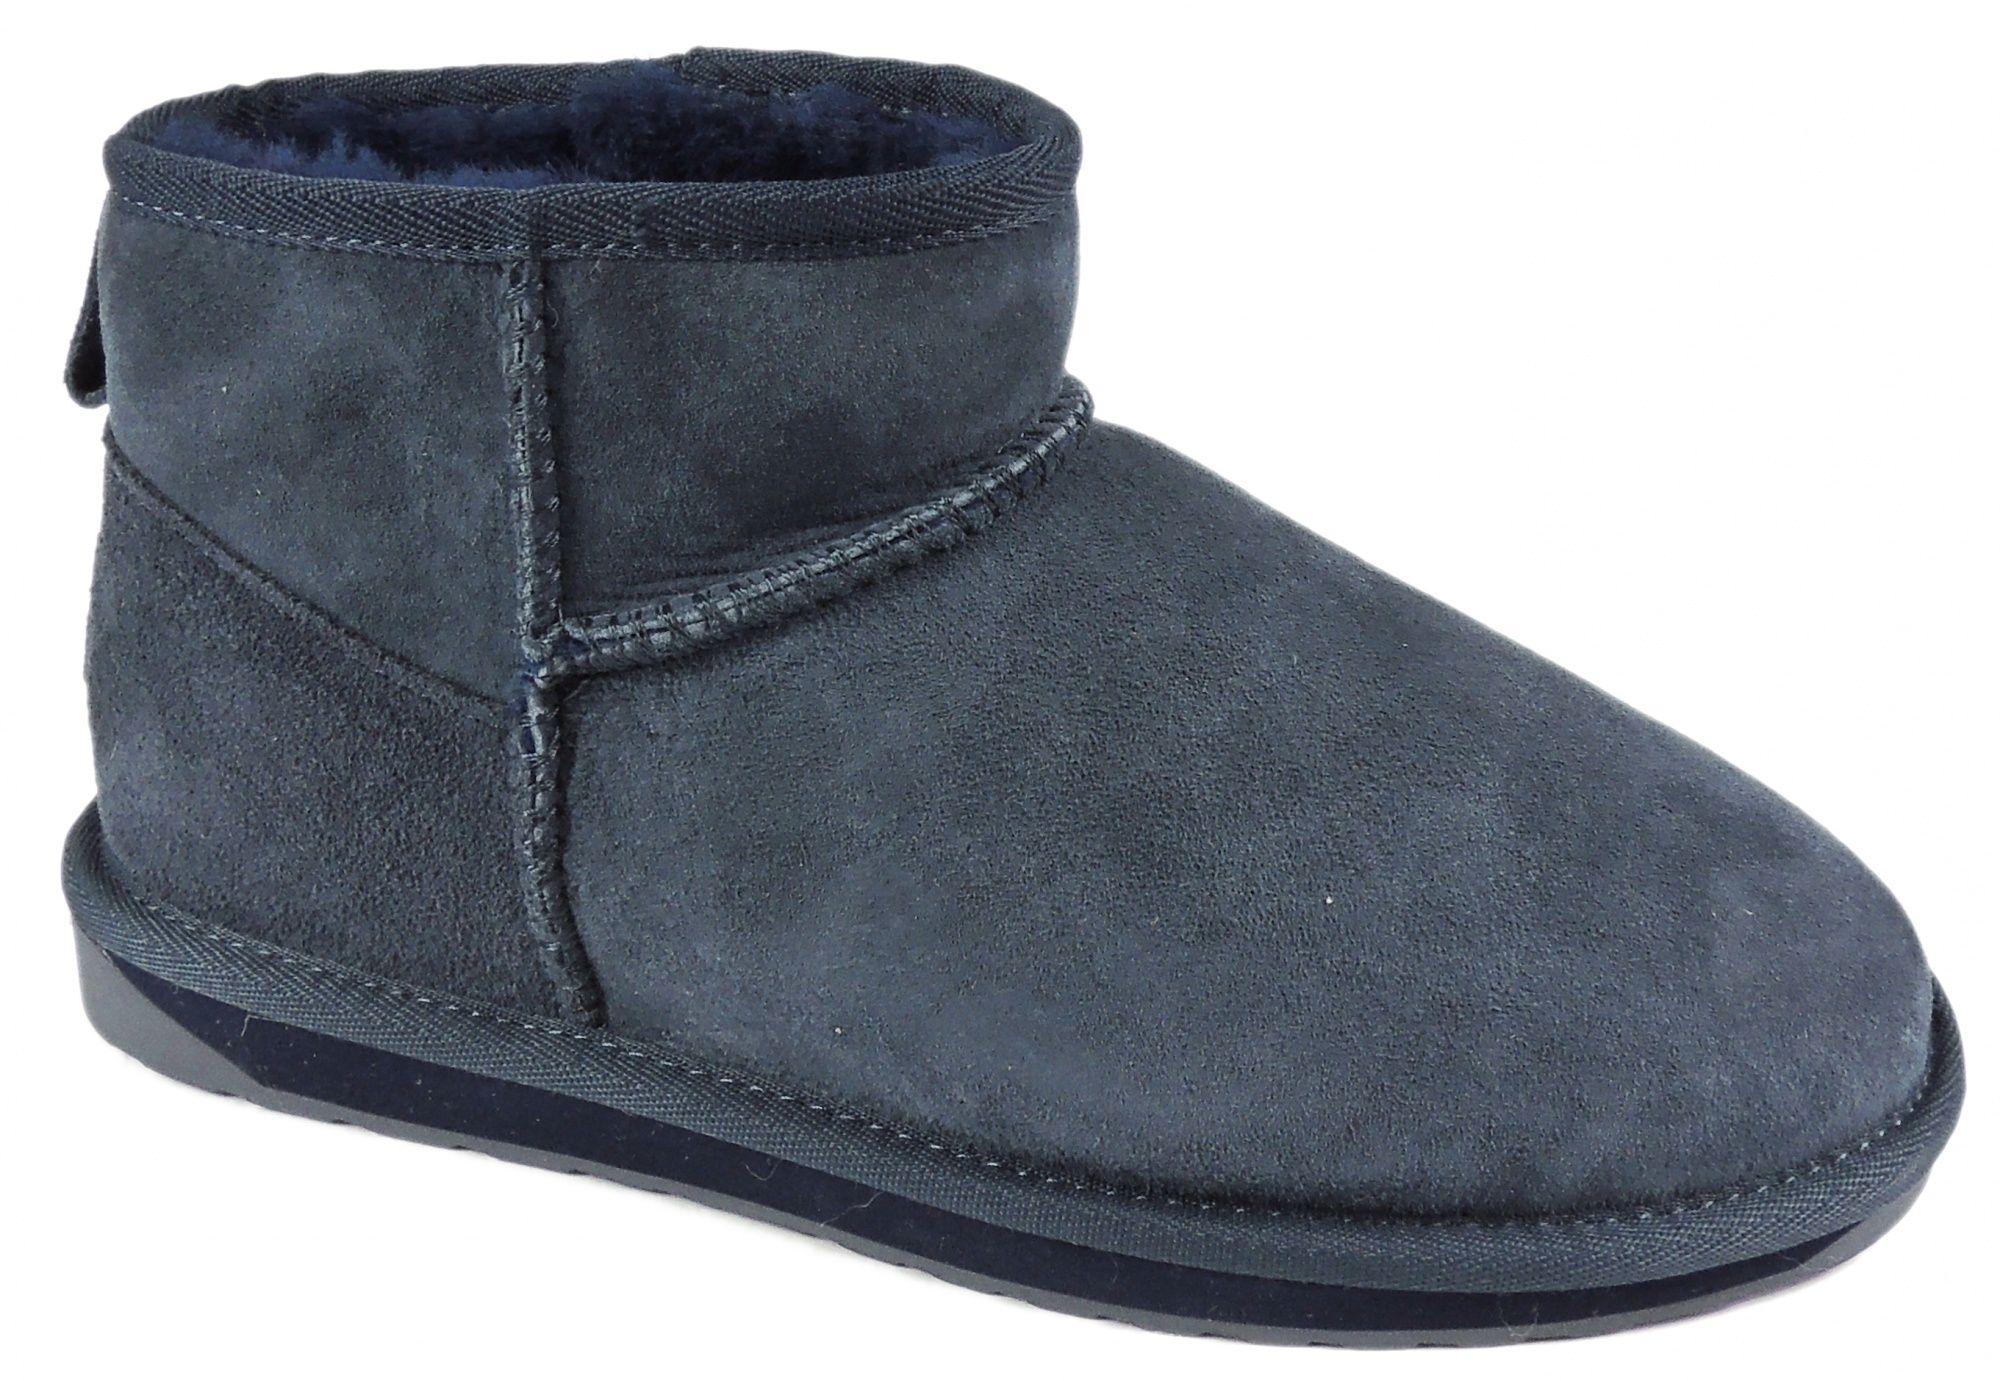 Botki Emu 3580137d Botki Damskie Intershoe Com Pl Boots Ugg Boots Shoes